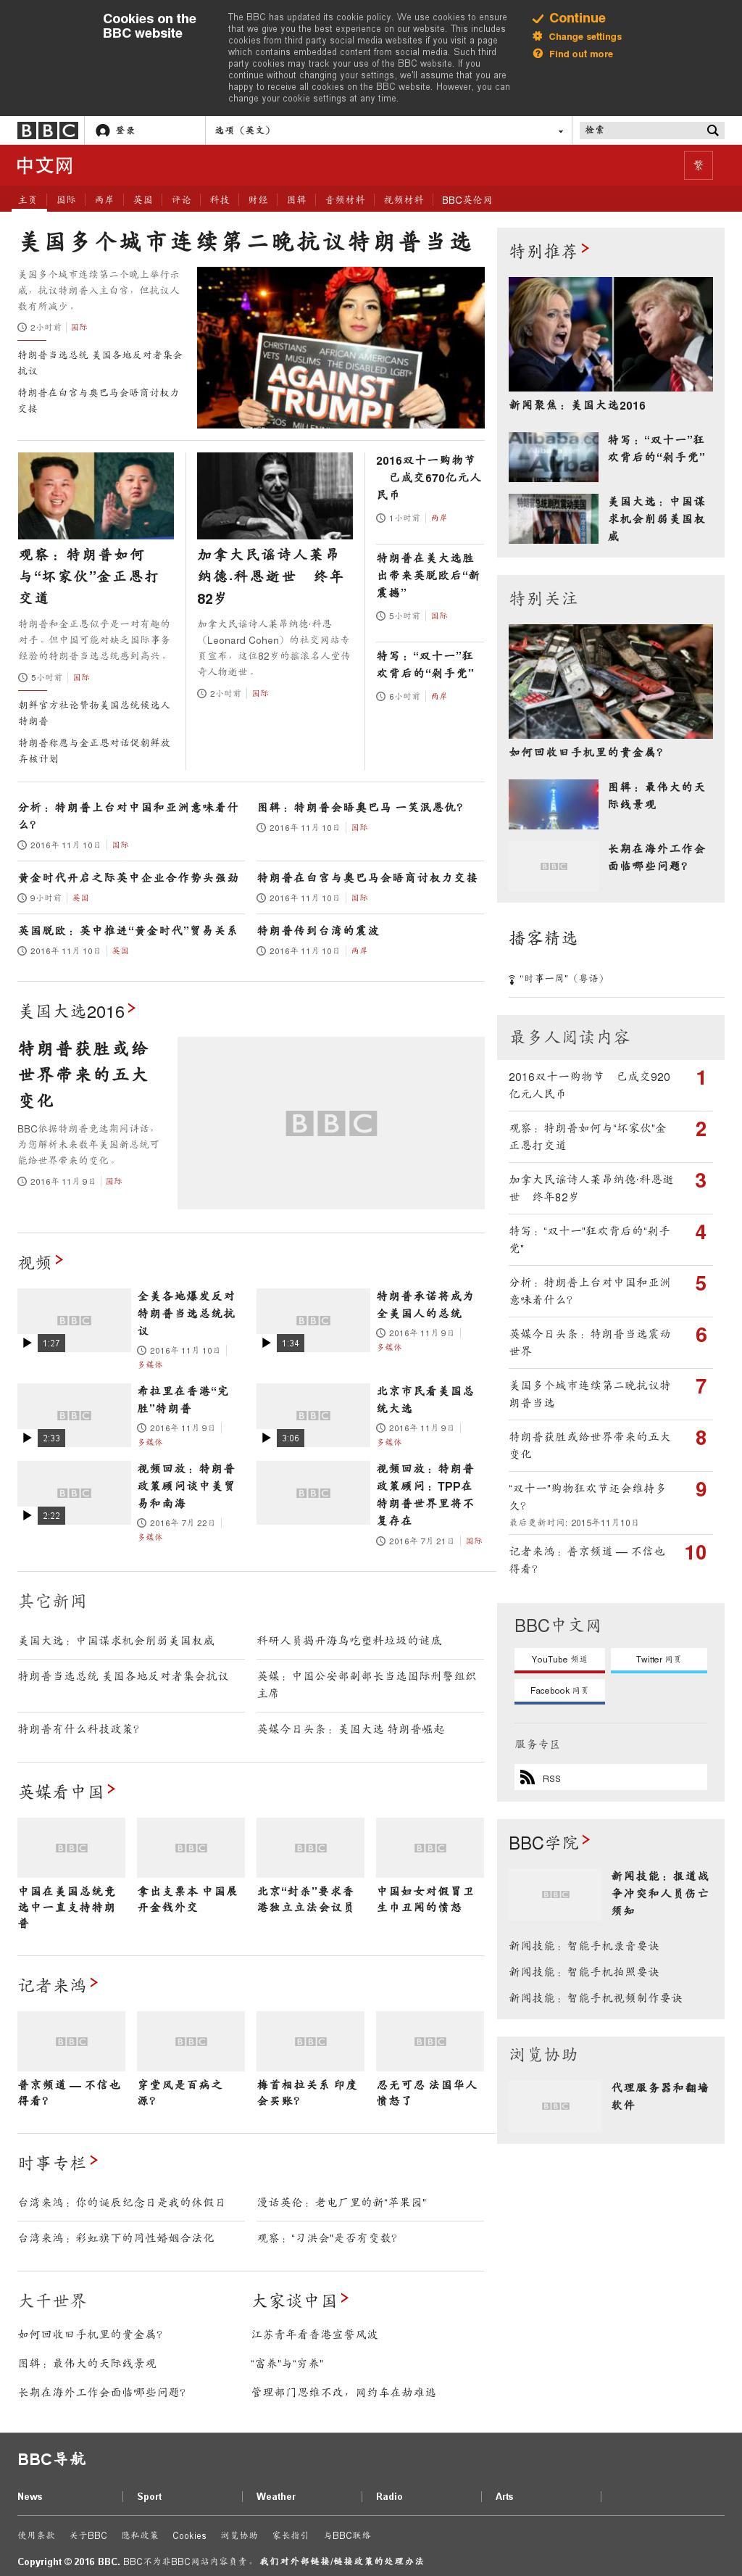 BBC (Chinese) at Friday Nov. 11, 2016, 9 a.m. UTC